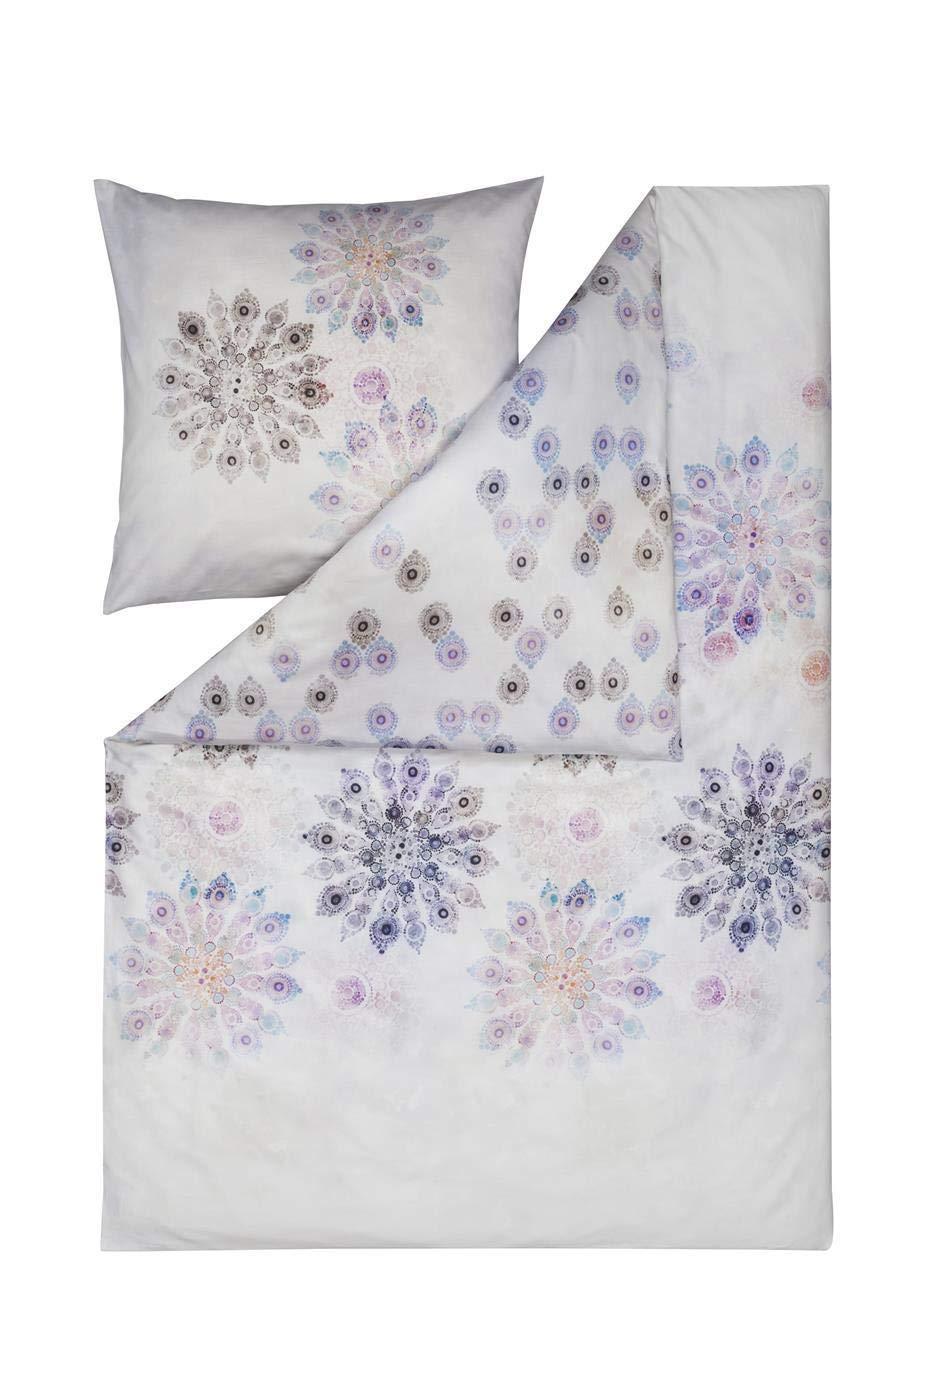 Estella Mako Satin Bettwäsche 4 teilig Bettbezug 135 x 200 cm Kopfkissenbezug 80 x 80 cm Cadiz 4721001-985 Multicolor